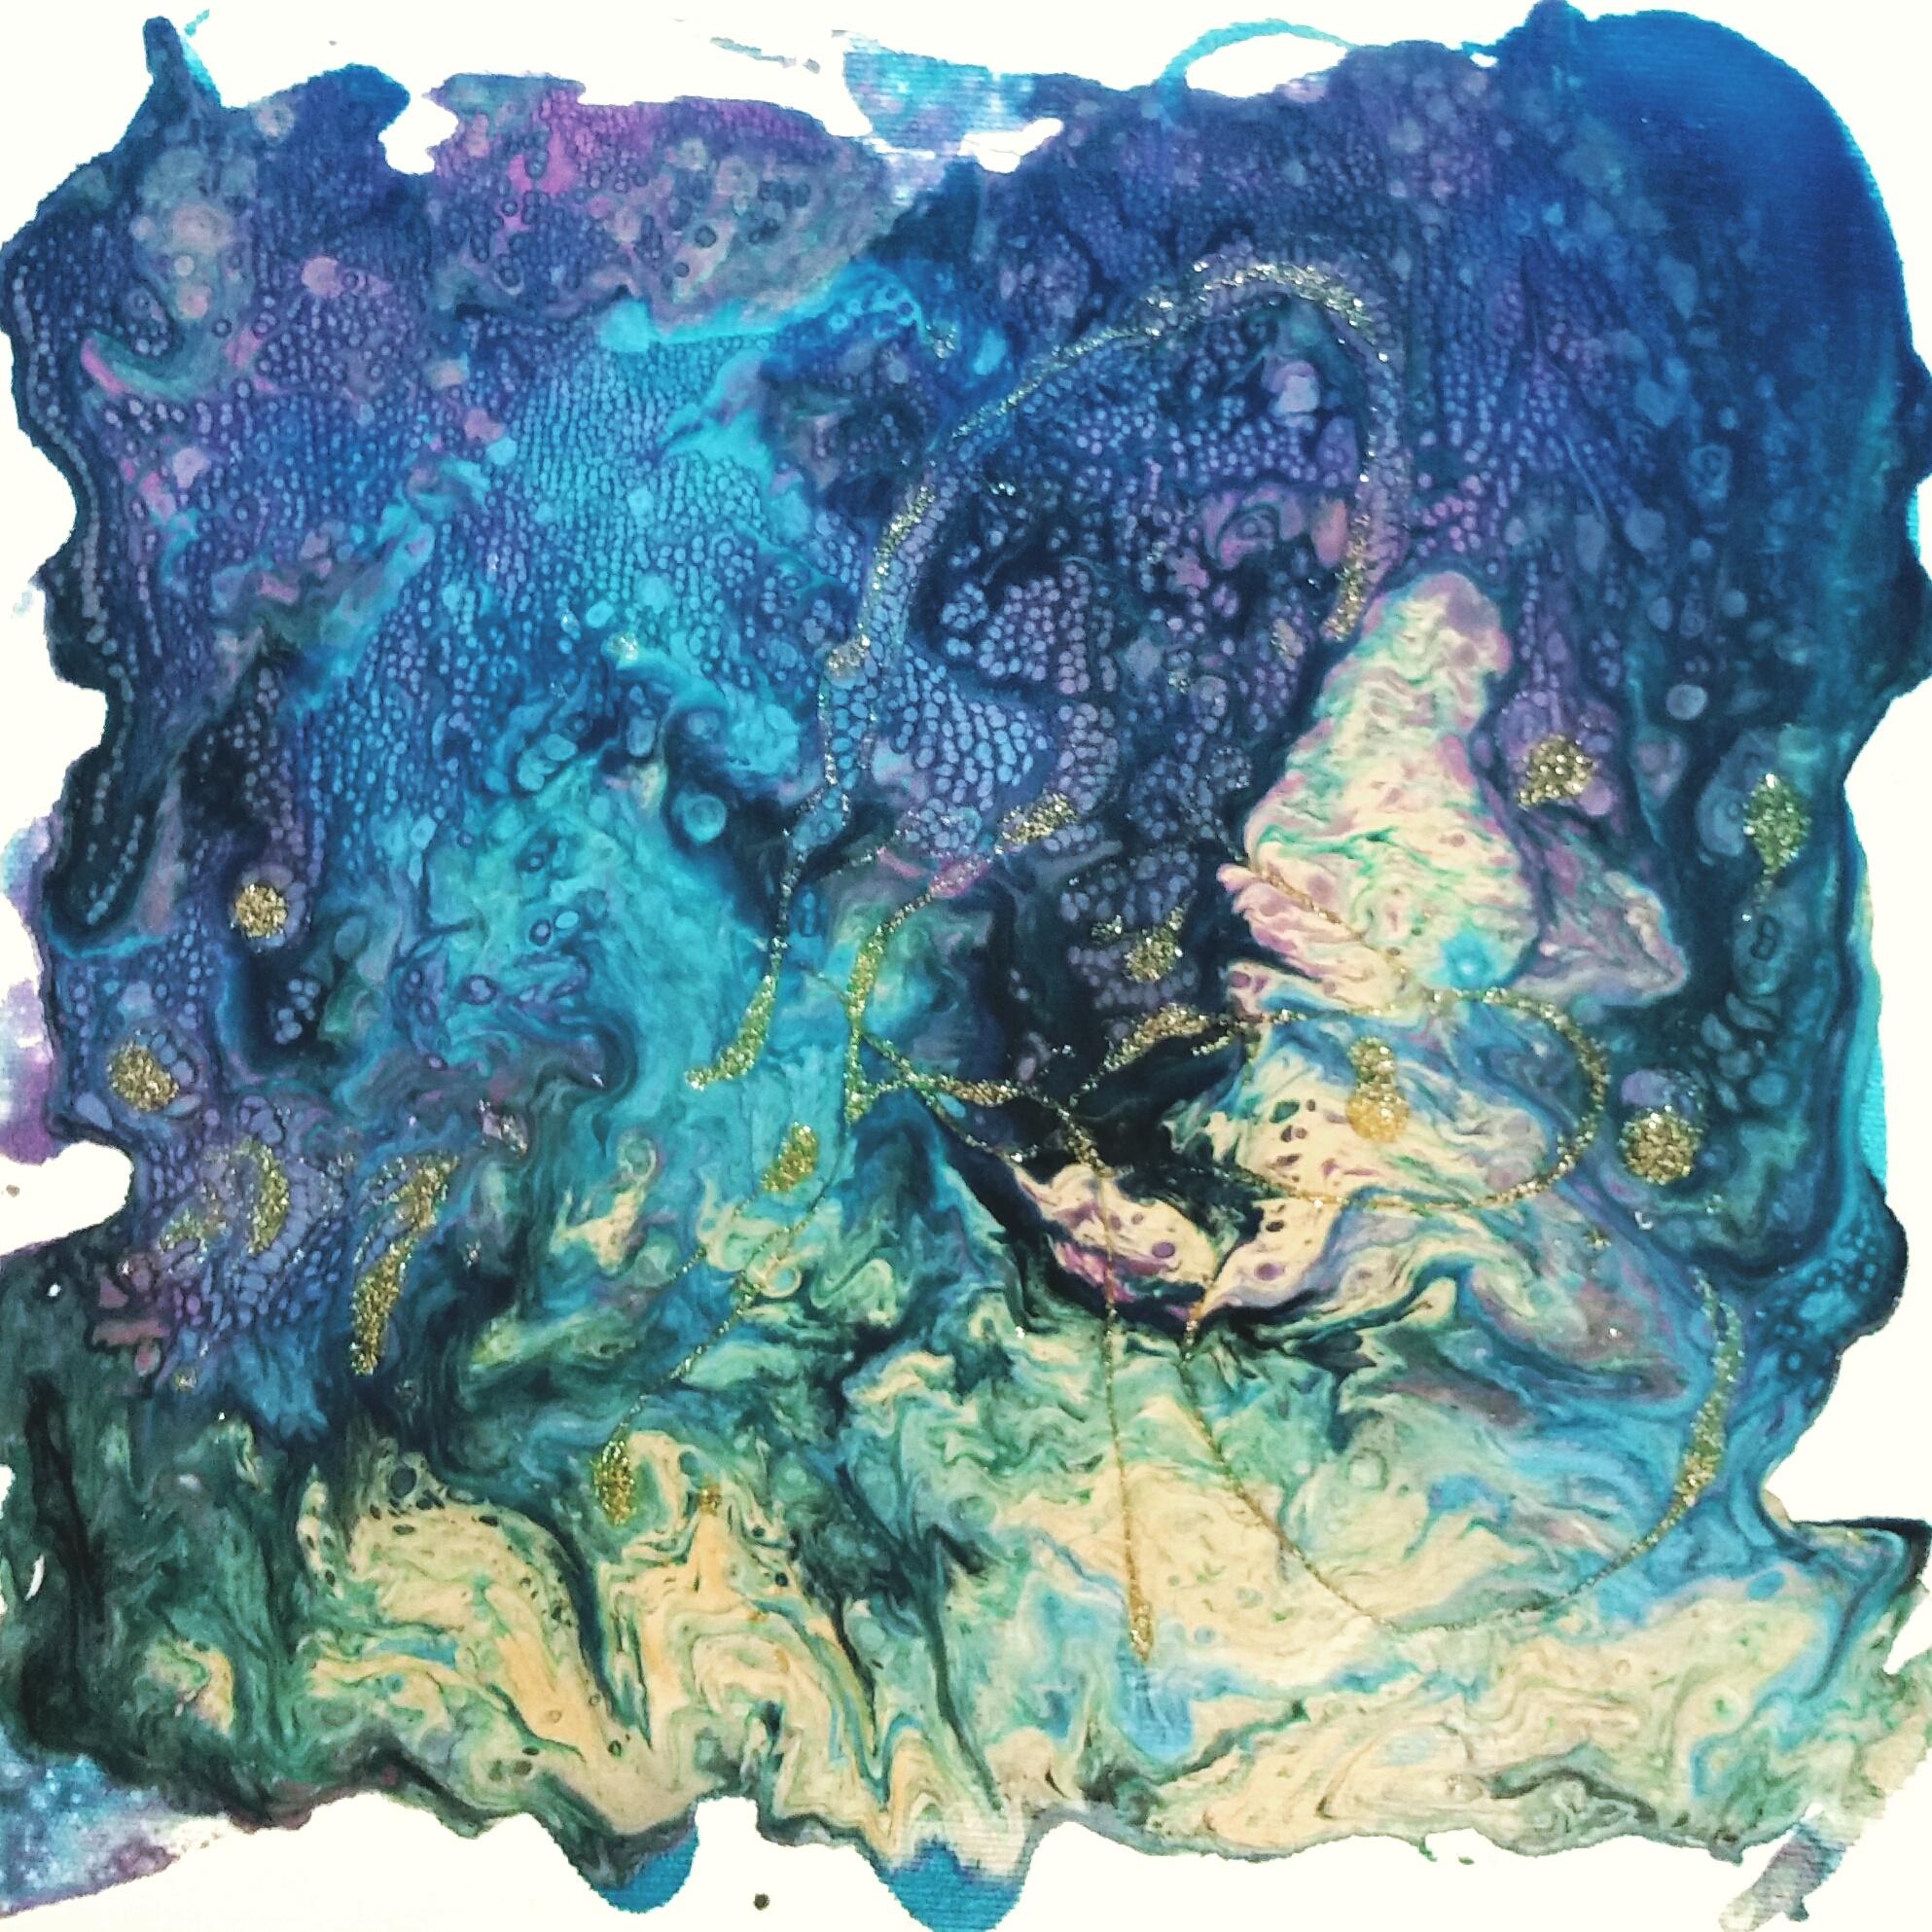 Pebeo Liquid Alkyd Oil paints: Vitrail, Vitrail Glitter, Fantasy Prisme and Fantasy Moon on canvas.